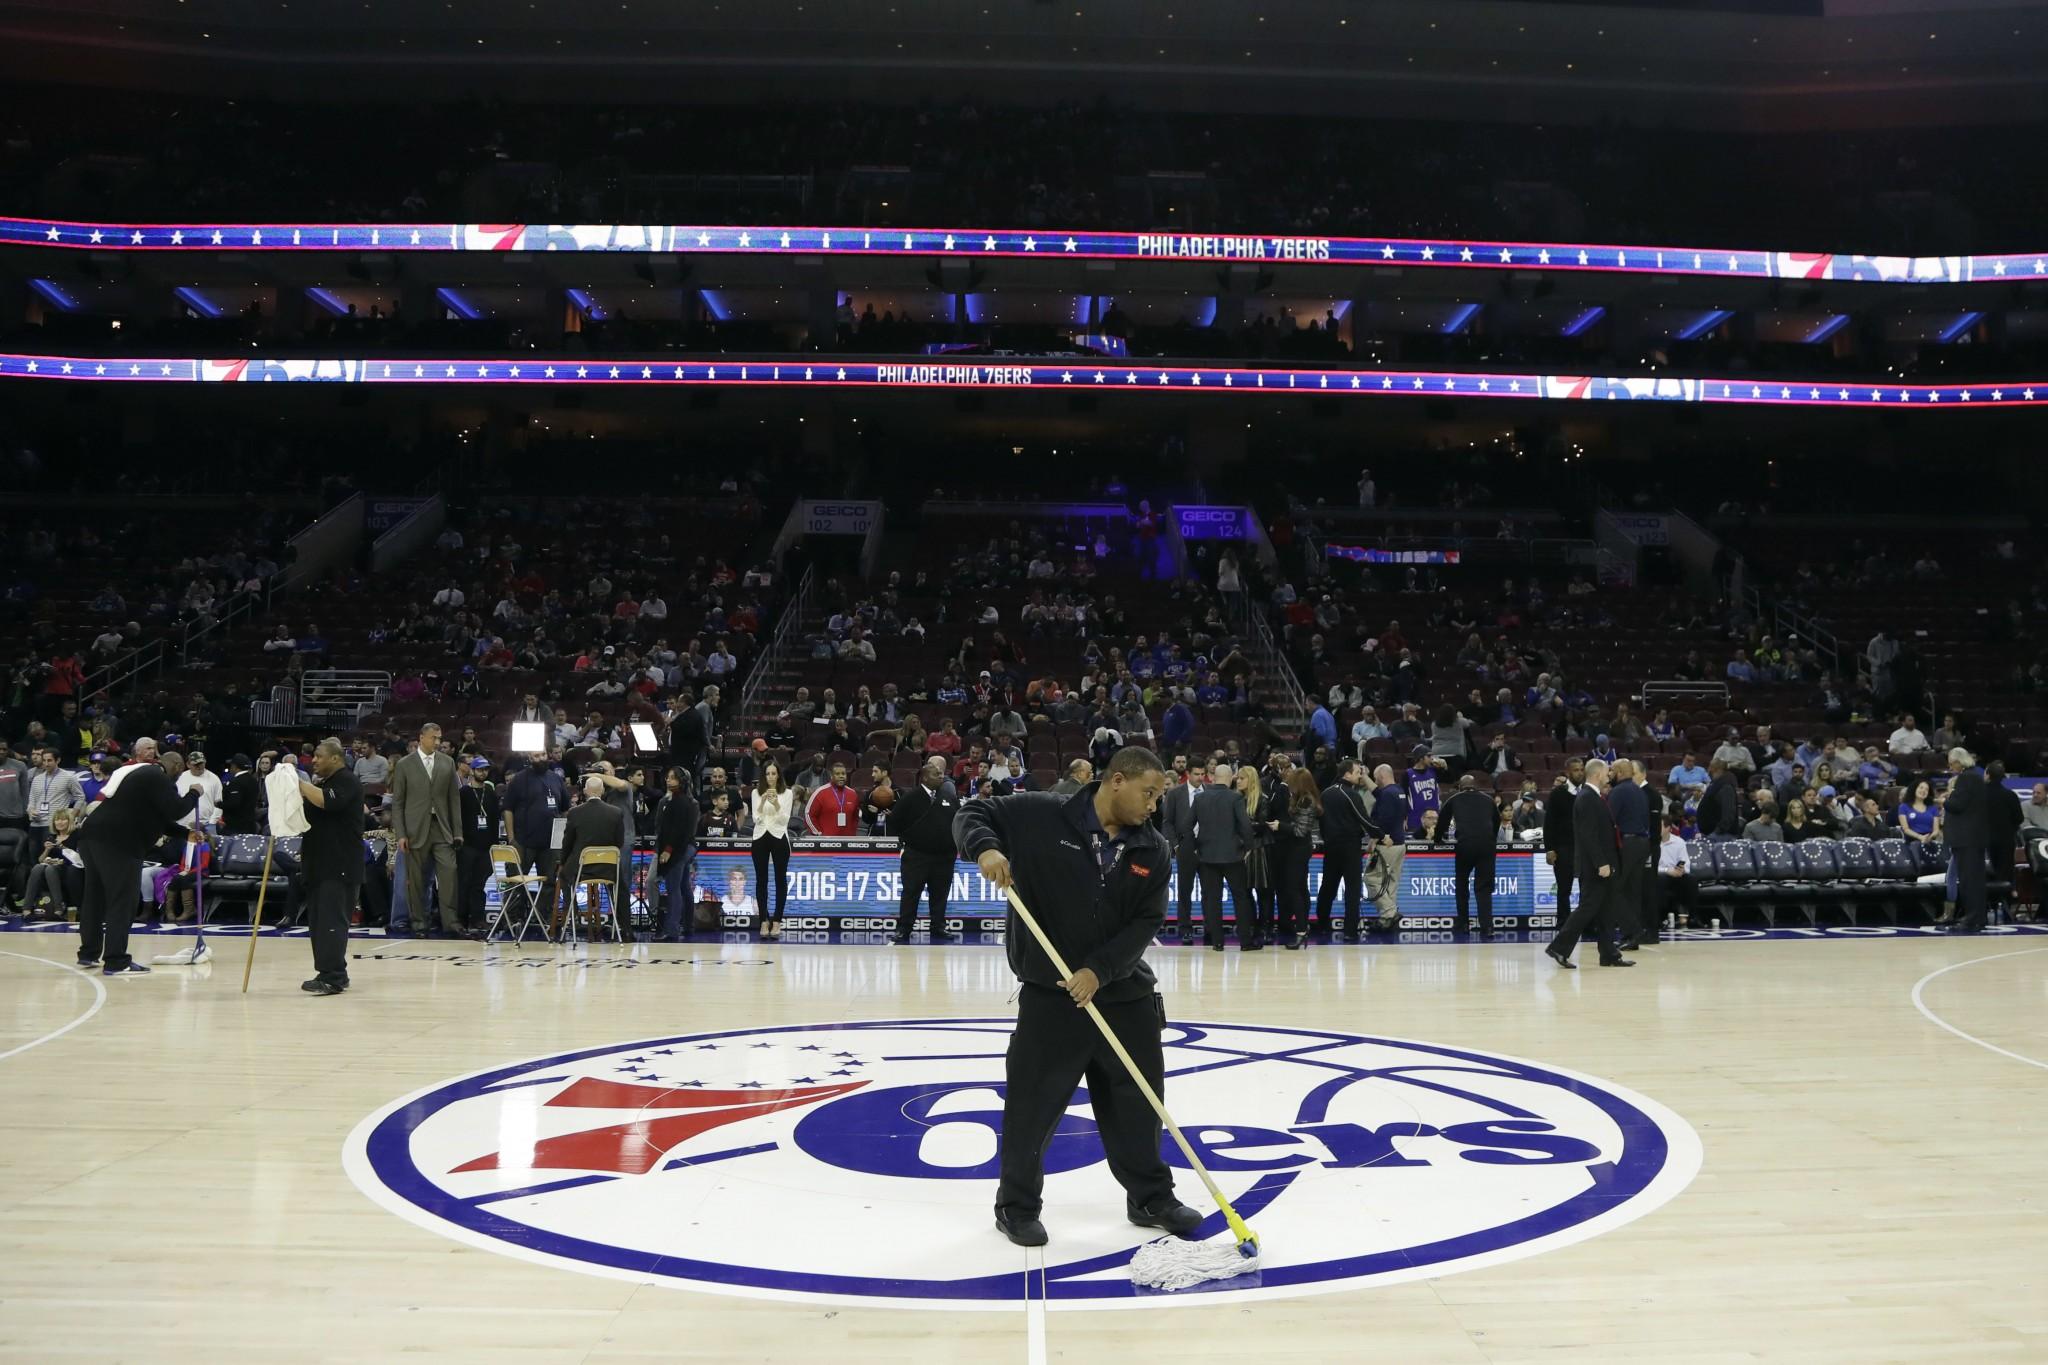 76ers-Kings postponed due to slick, slippery floor in Philly